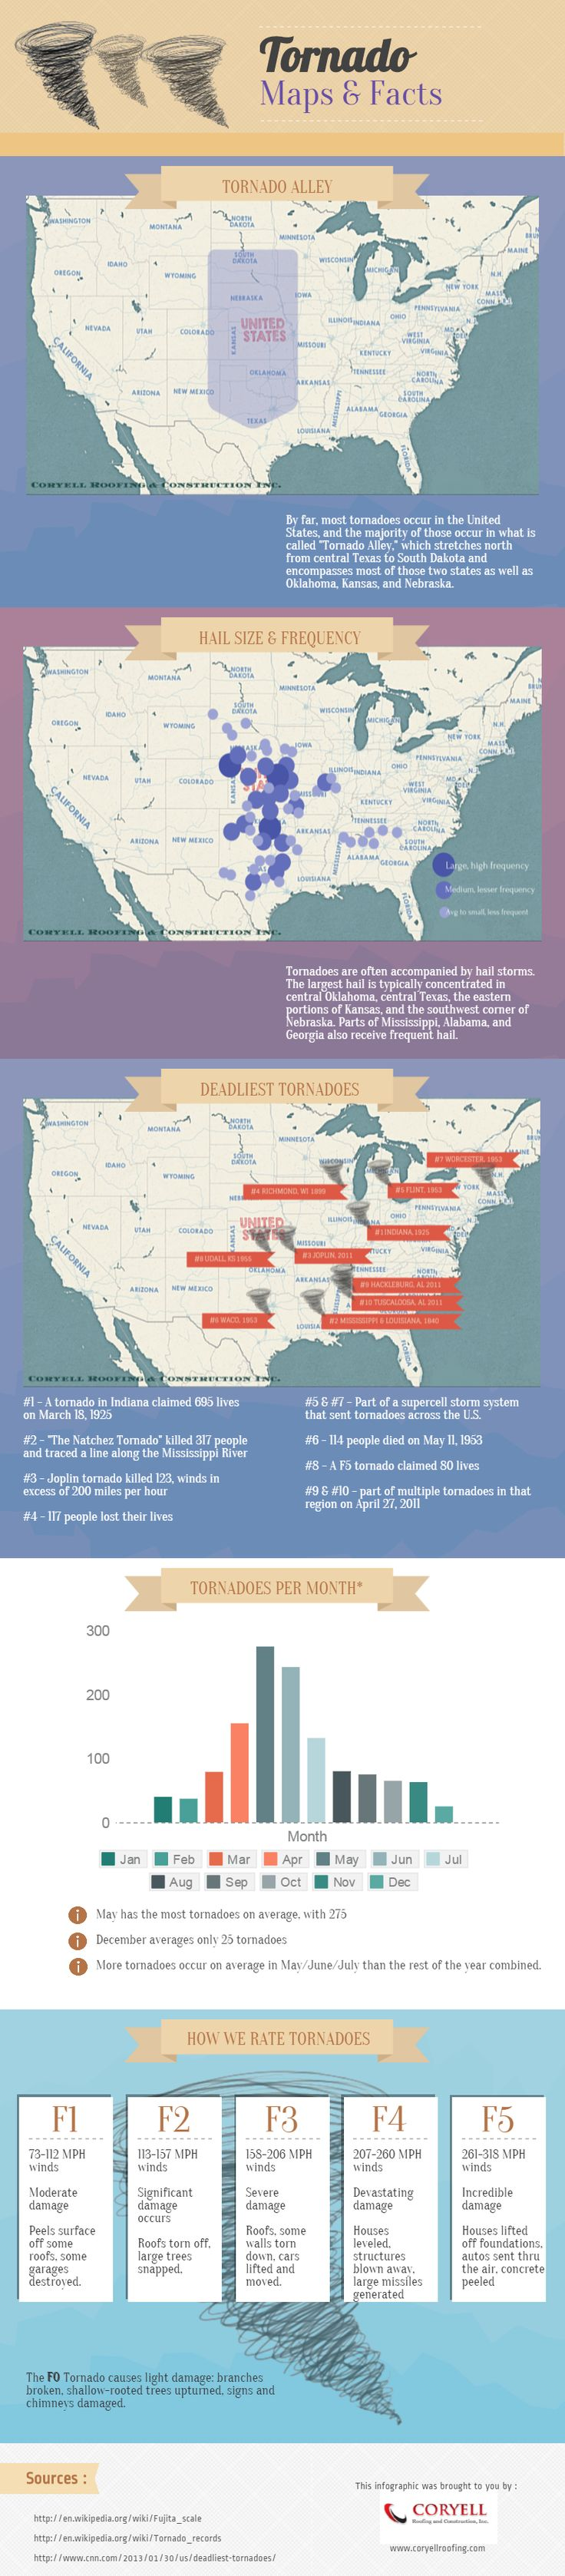 Tornado Maps & facts